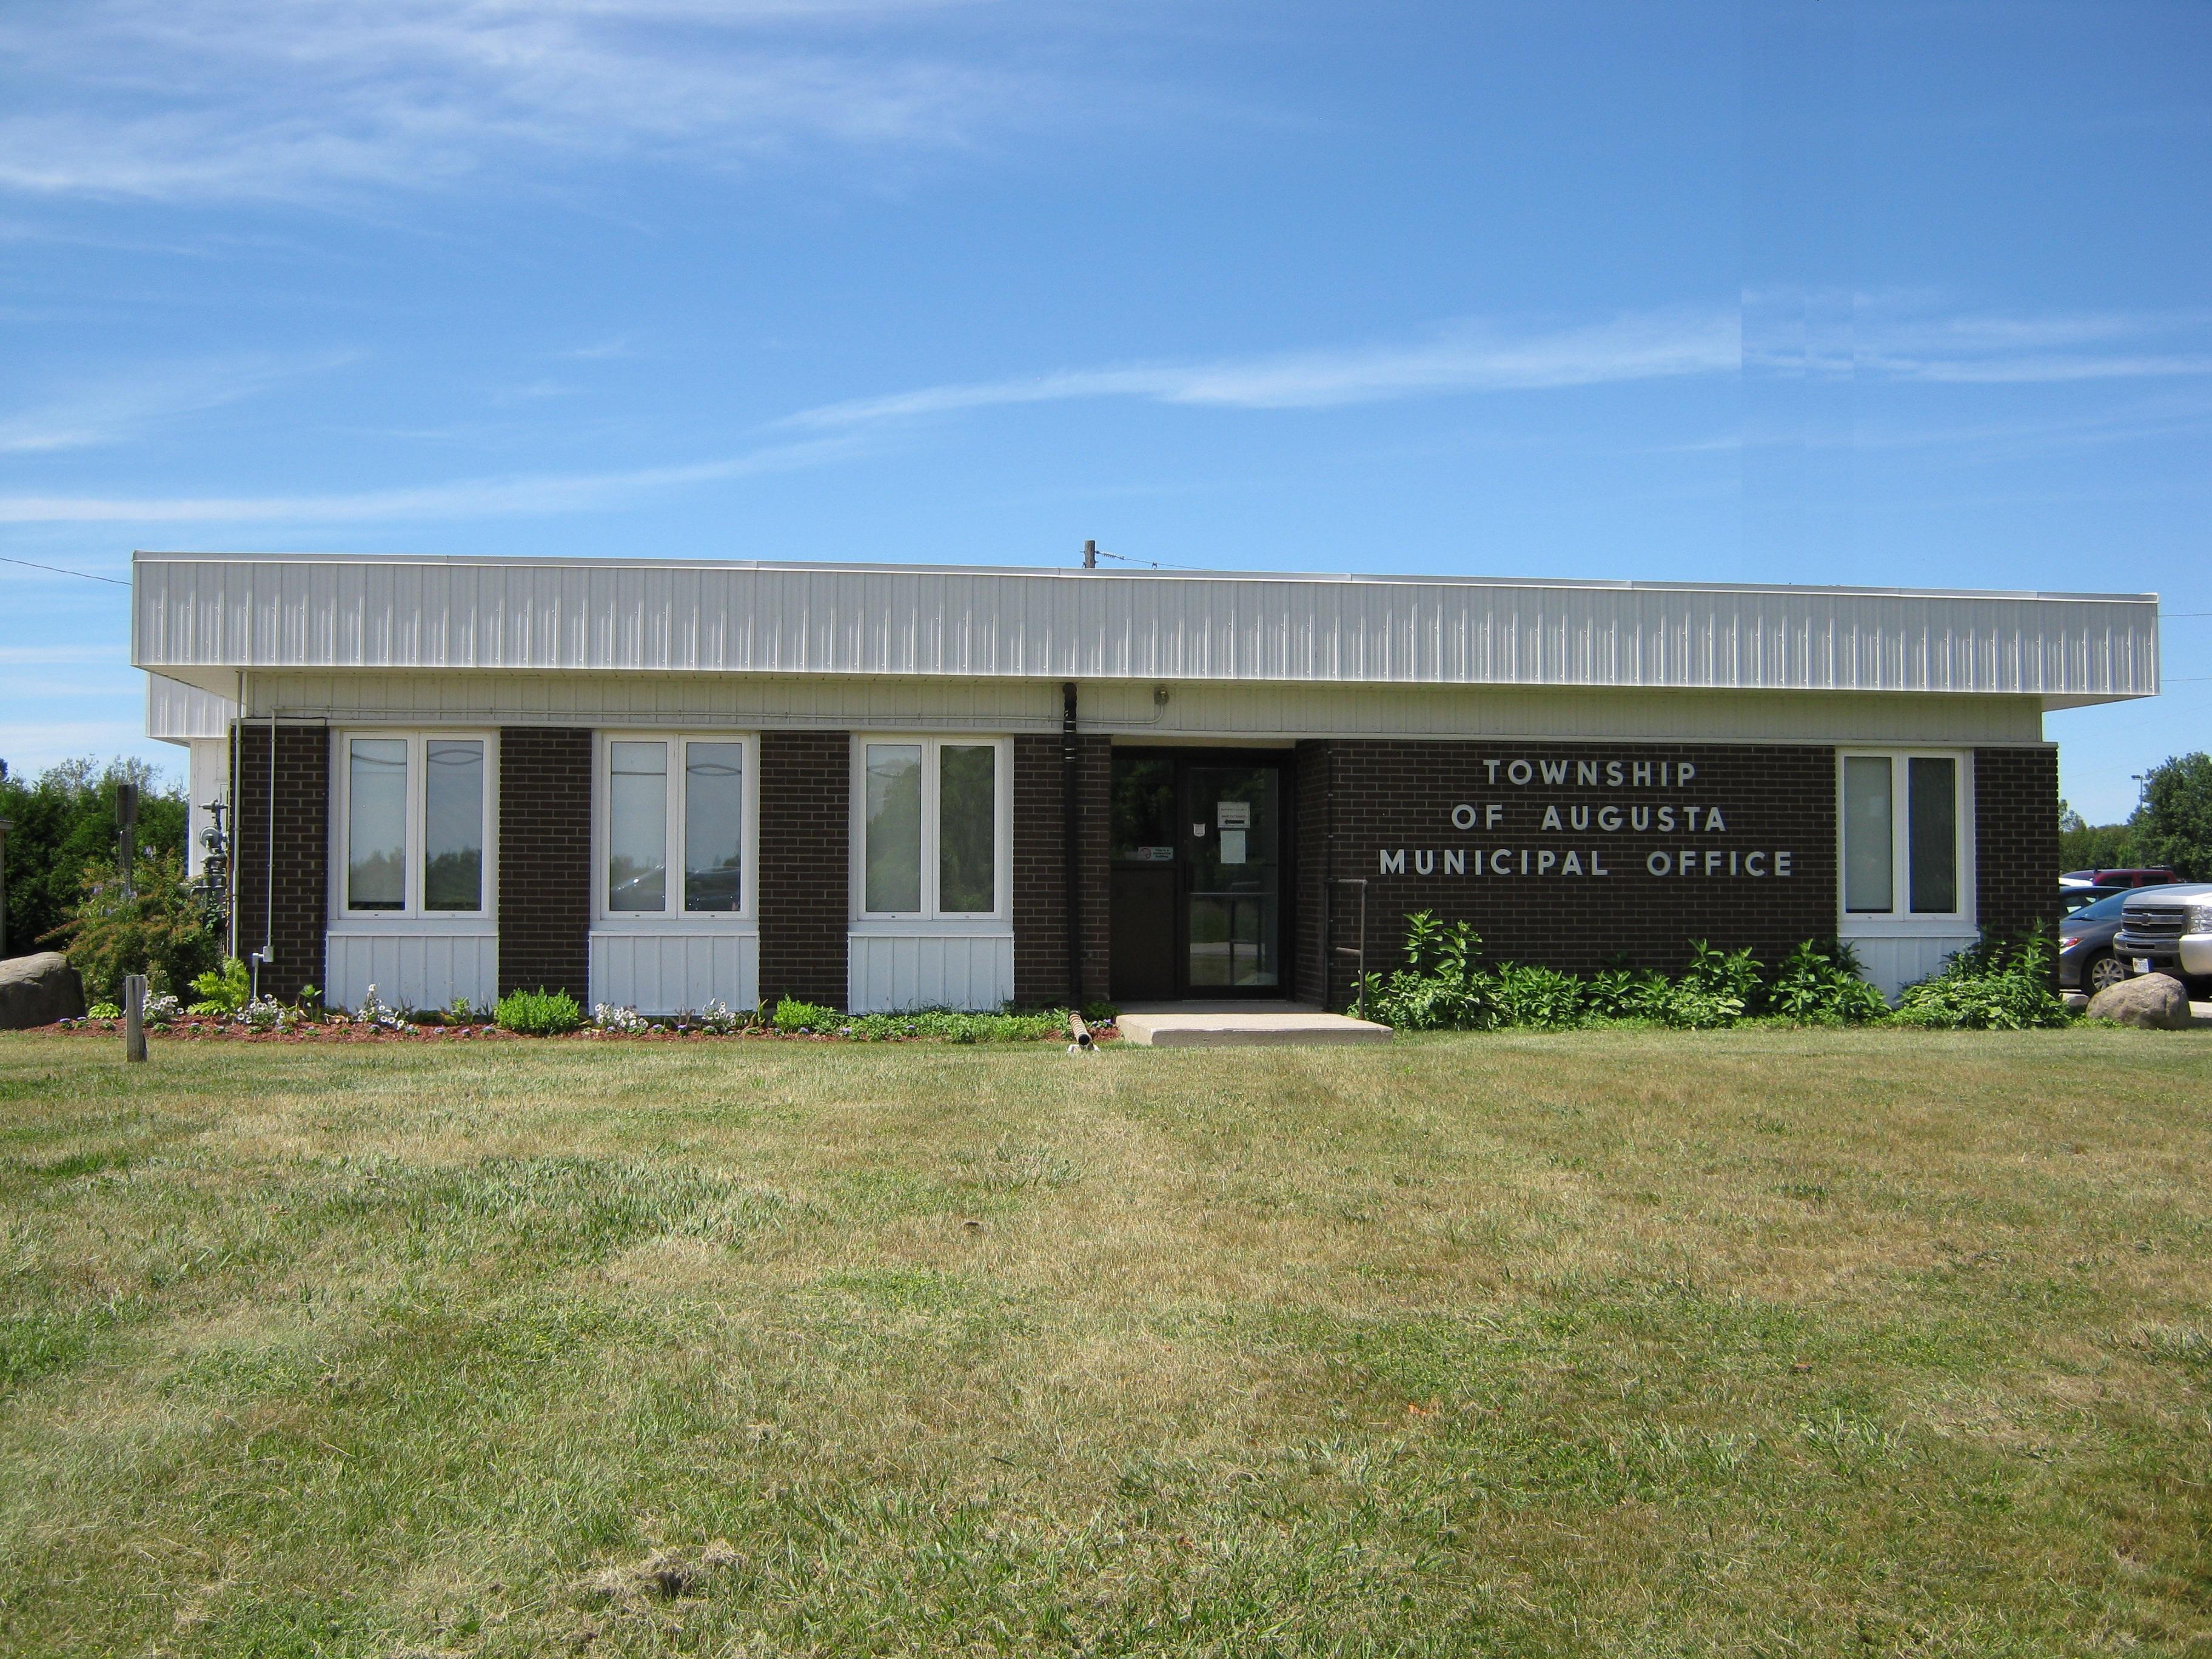 township office in Maynard circa 2018